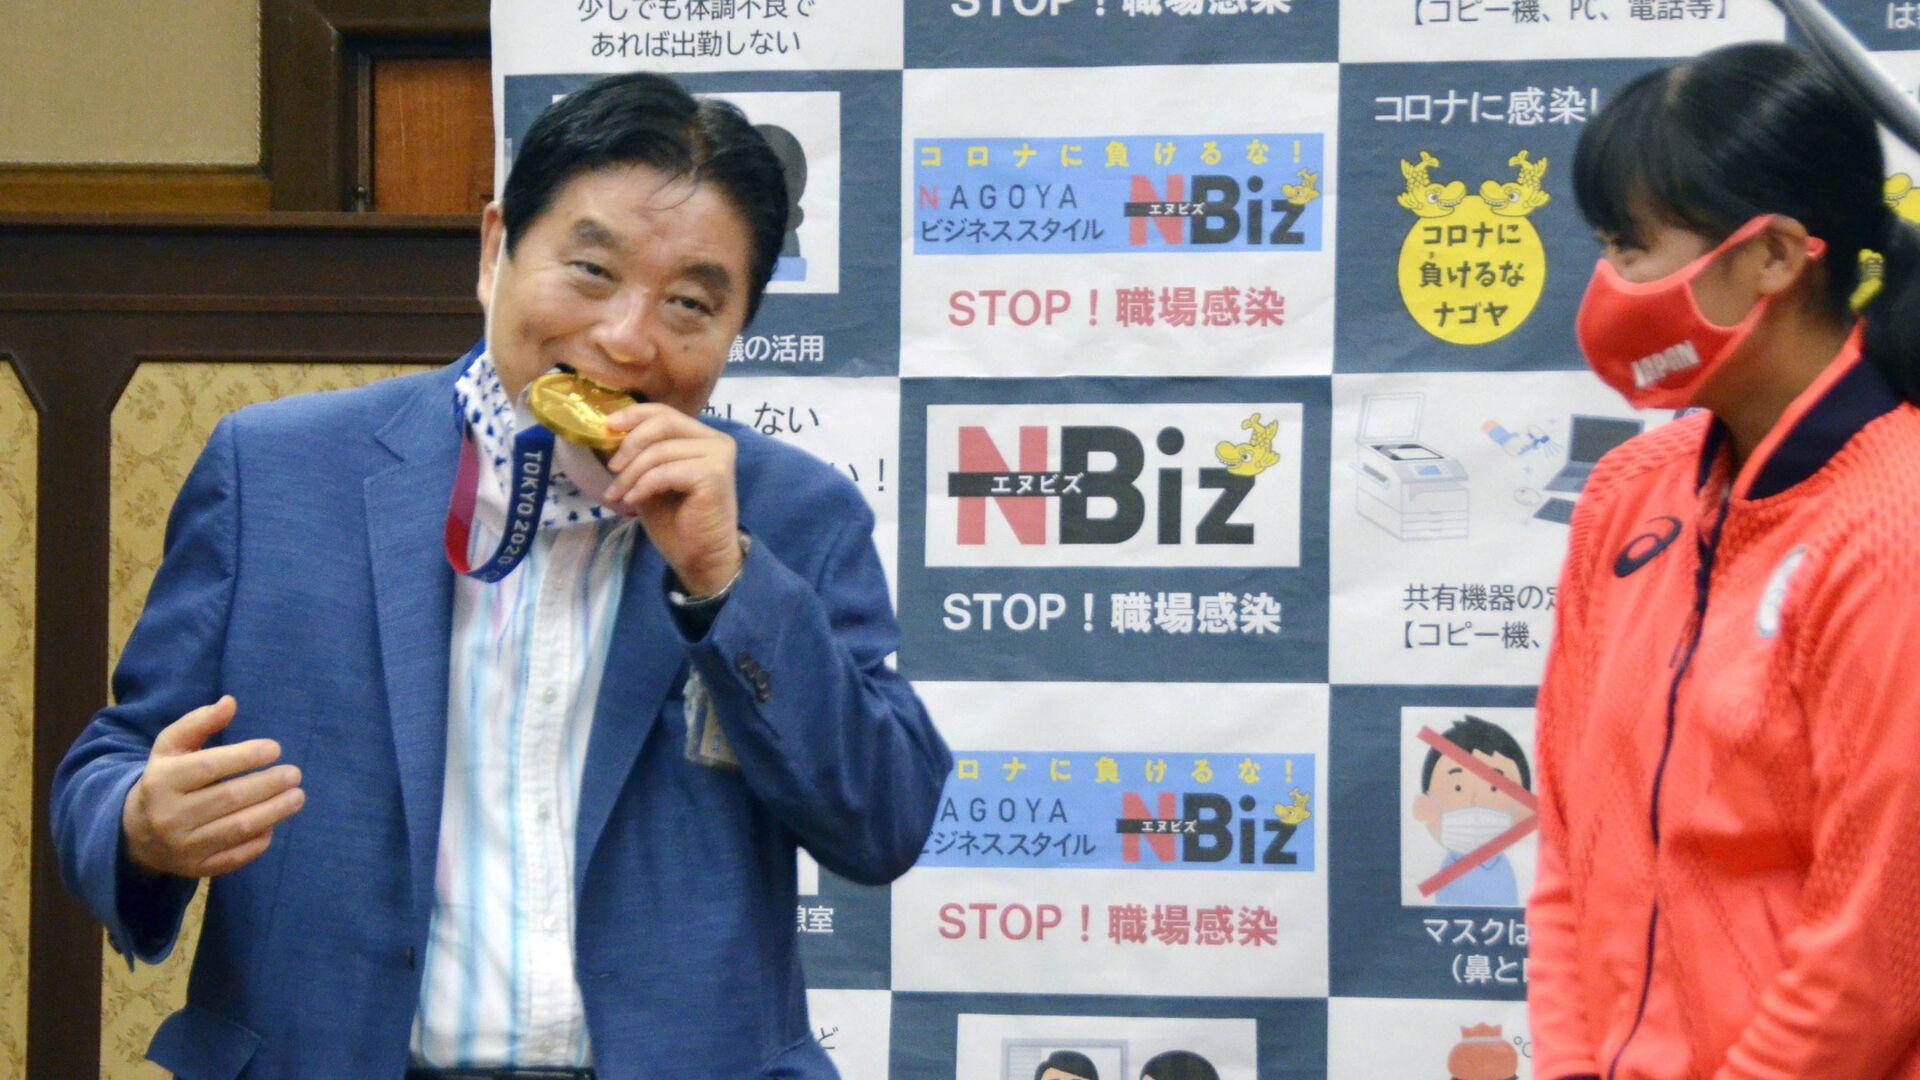 Il sindaco di Nagoya, Takashi Kawamura, morde la medaglia dell'atleta giapponese di softball Miu Goto - Sputnik Italia, 1920, 12.08.2021